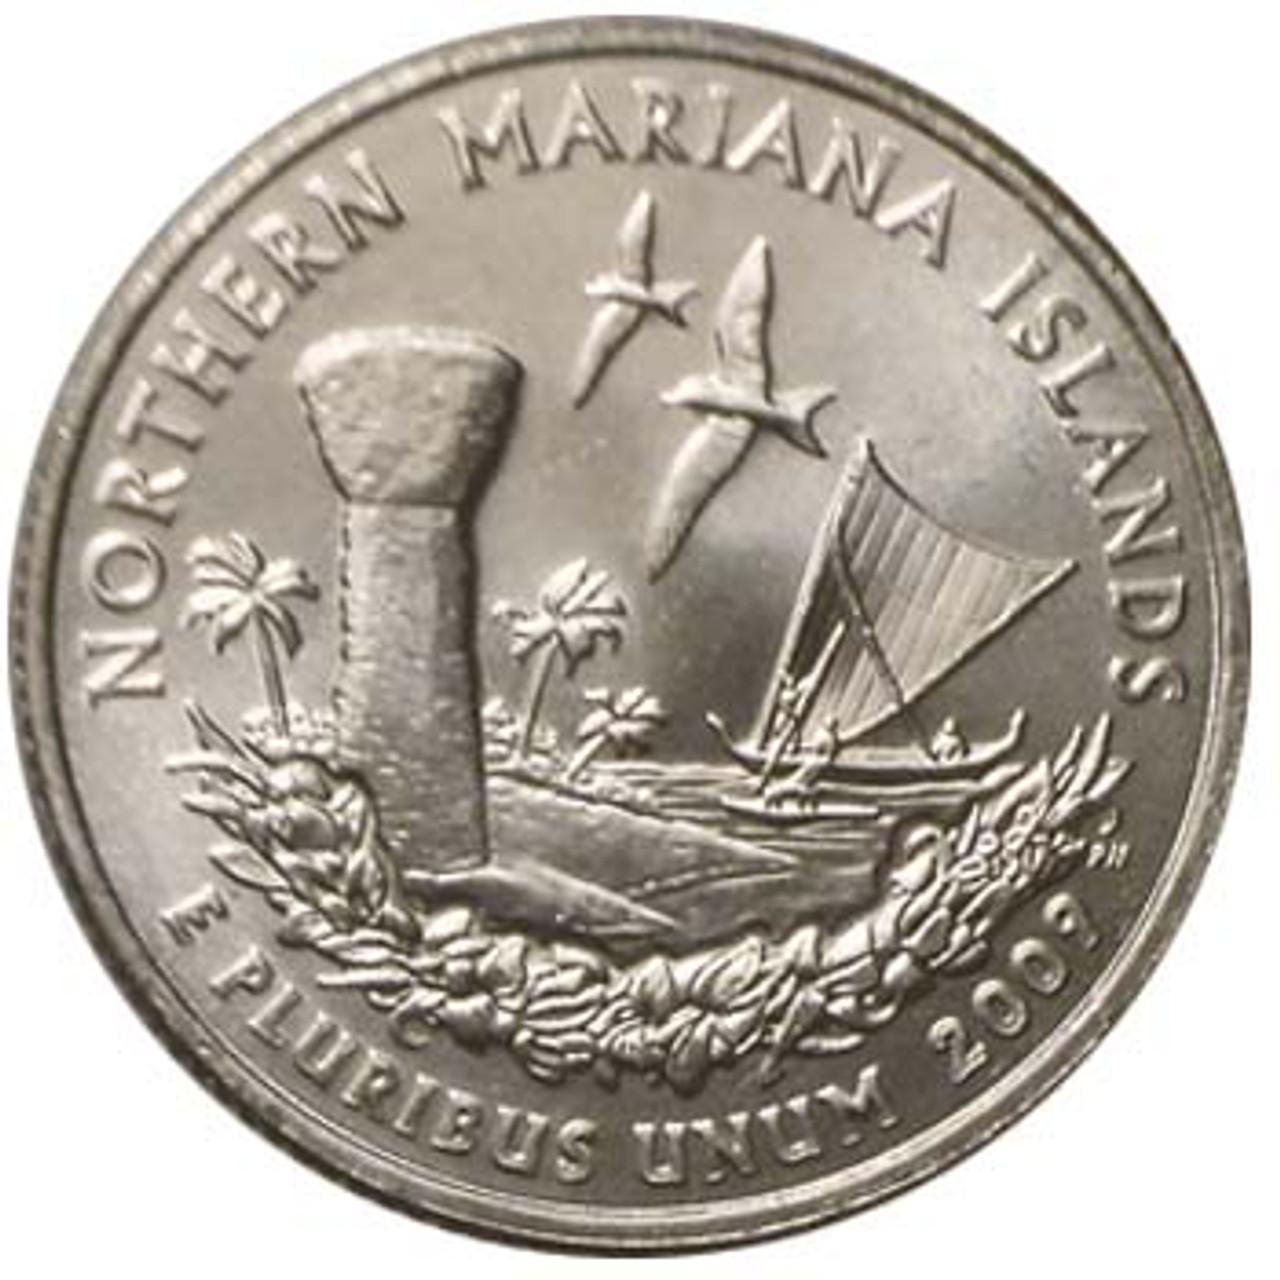 2009-P North Mariana Islands Quarter Brilliant Uncirculated Image 1